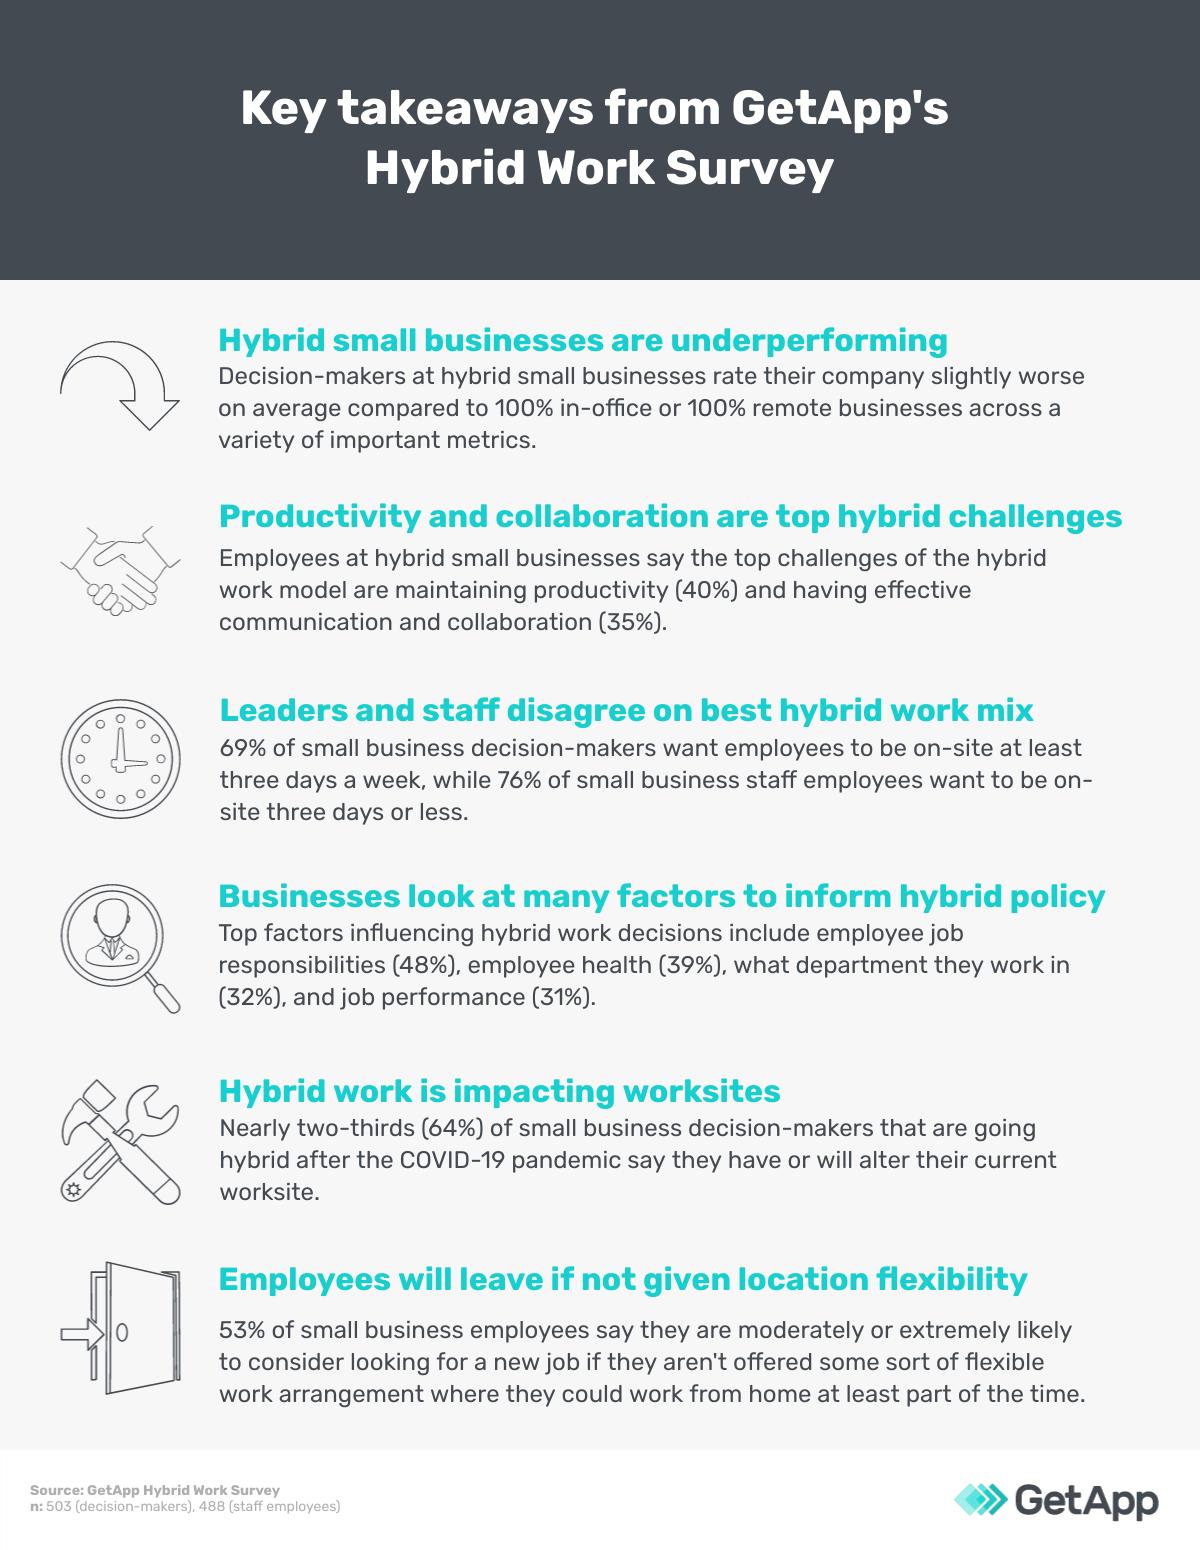 Key takeaways from GetApp's hybrid work survey